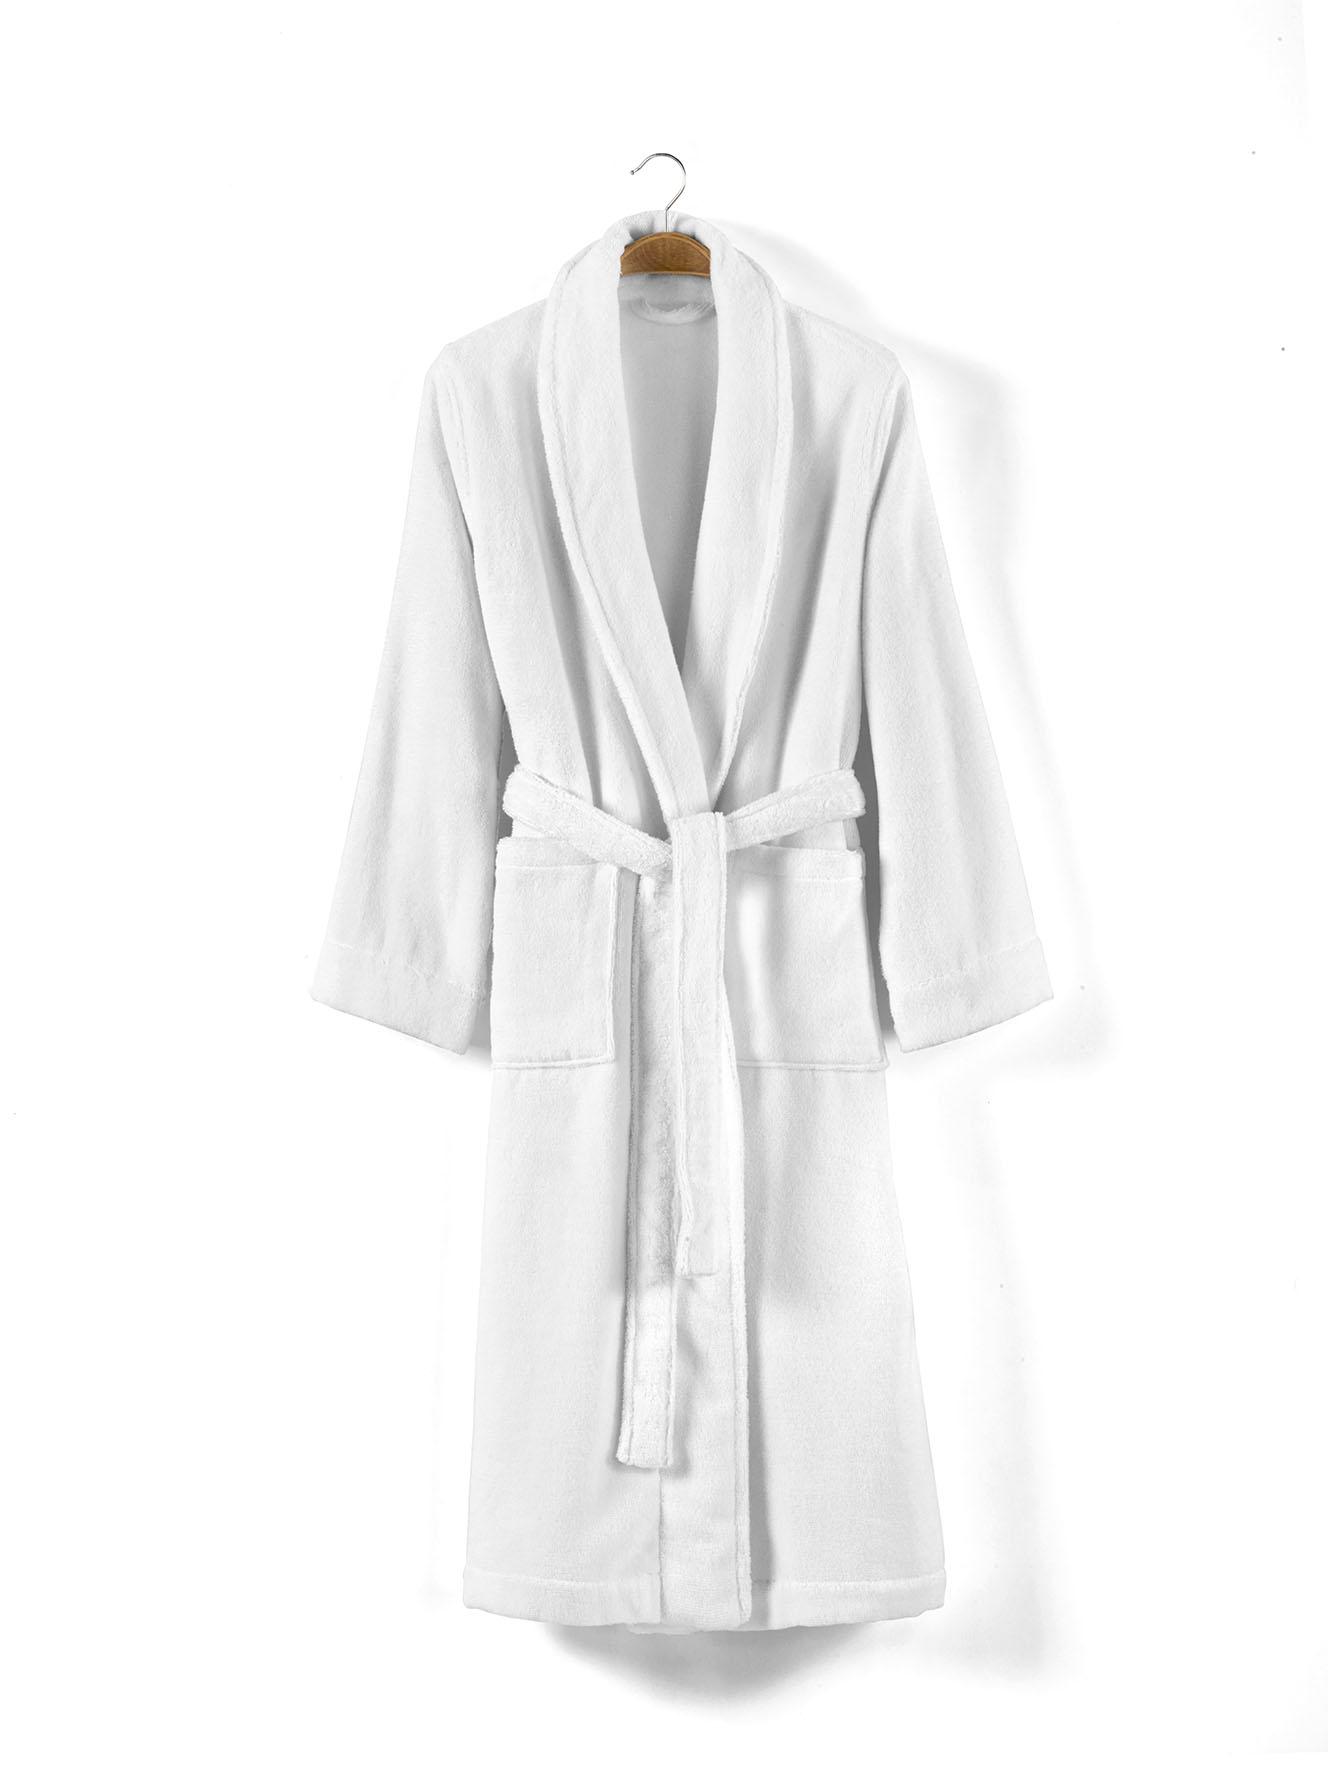 Банный халат Chicago Цвет: Белый (xL) CASUAL AVENUE cae365181